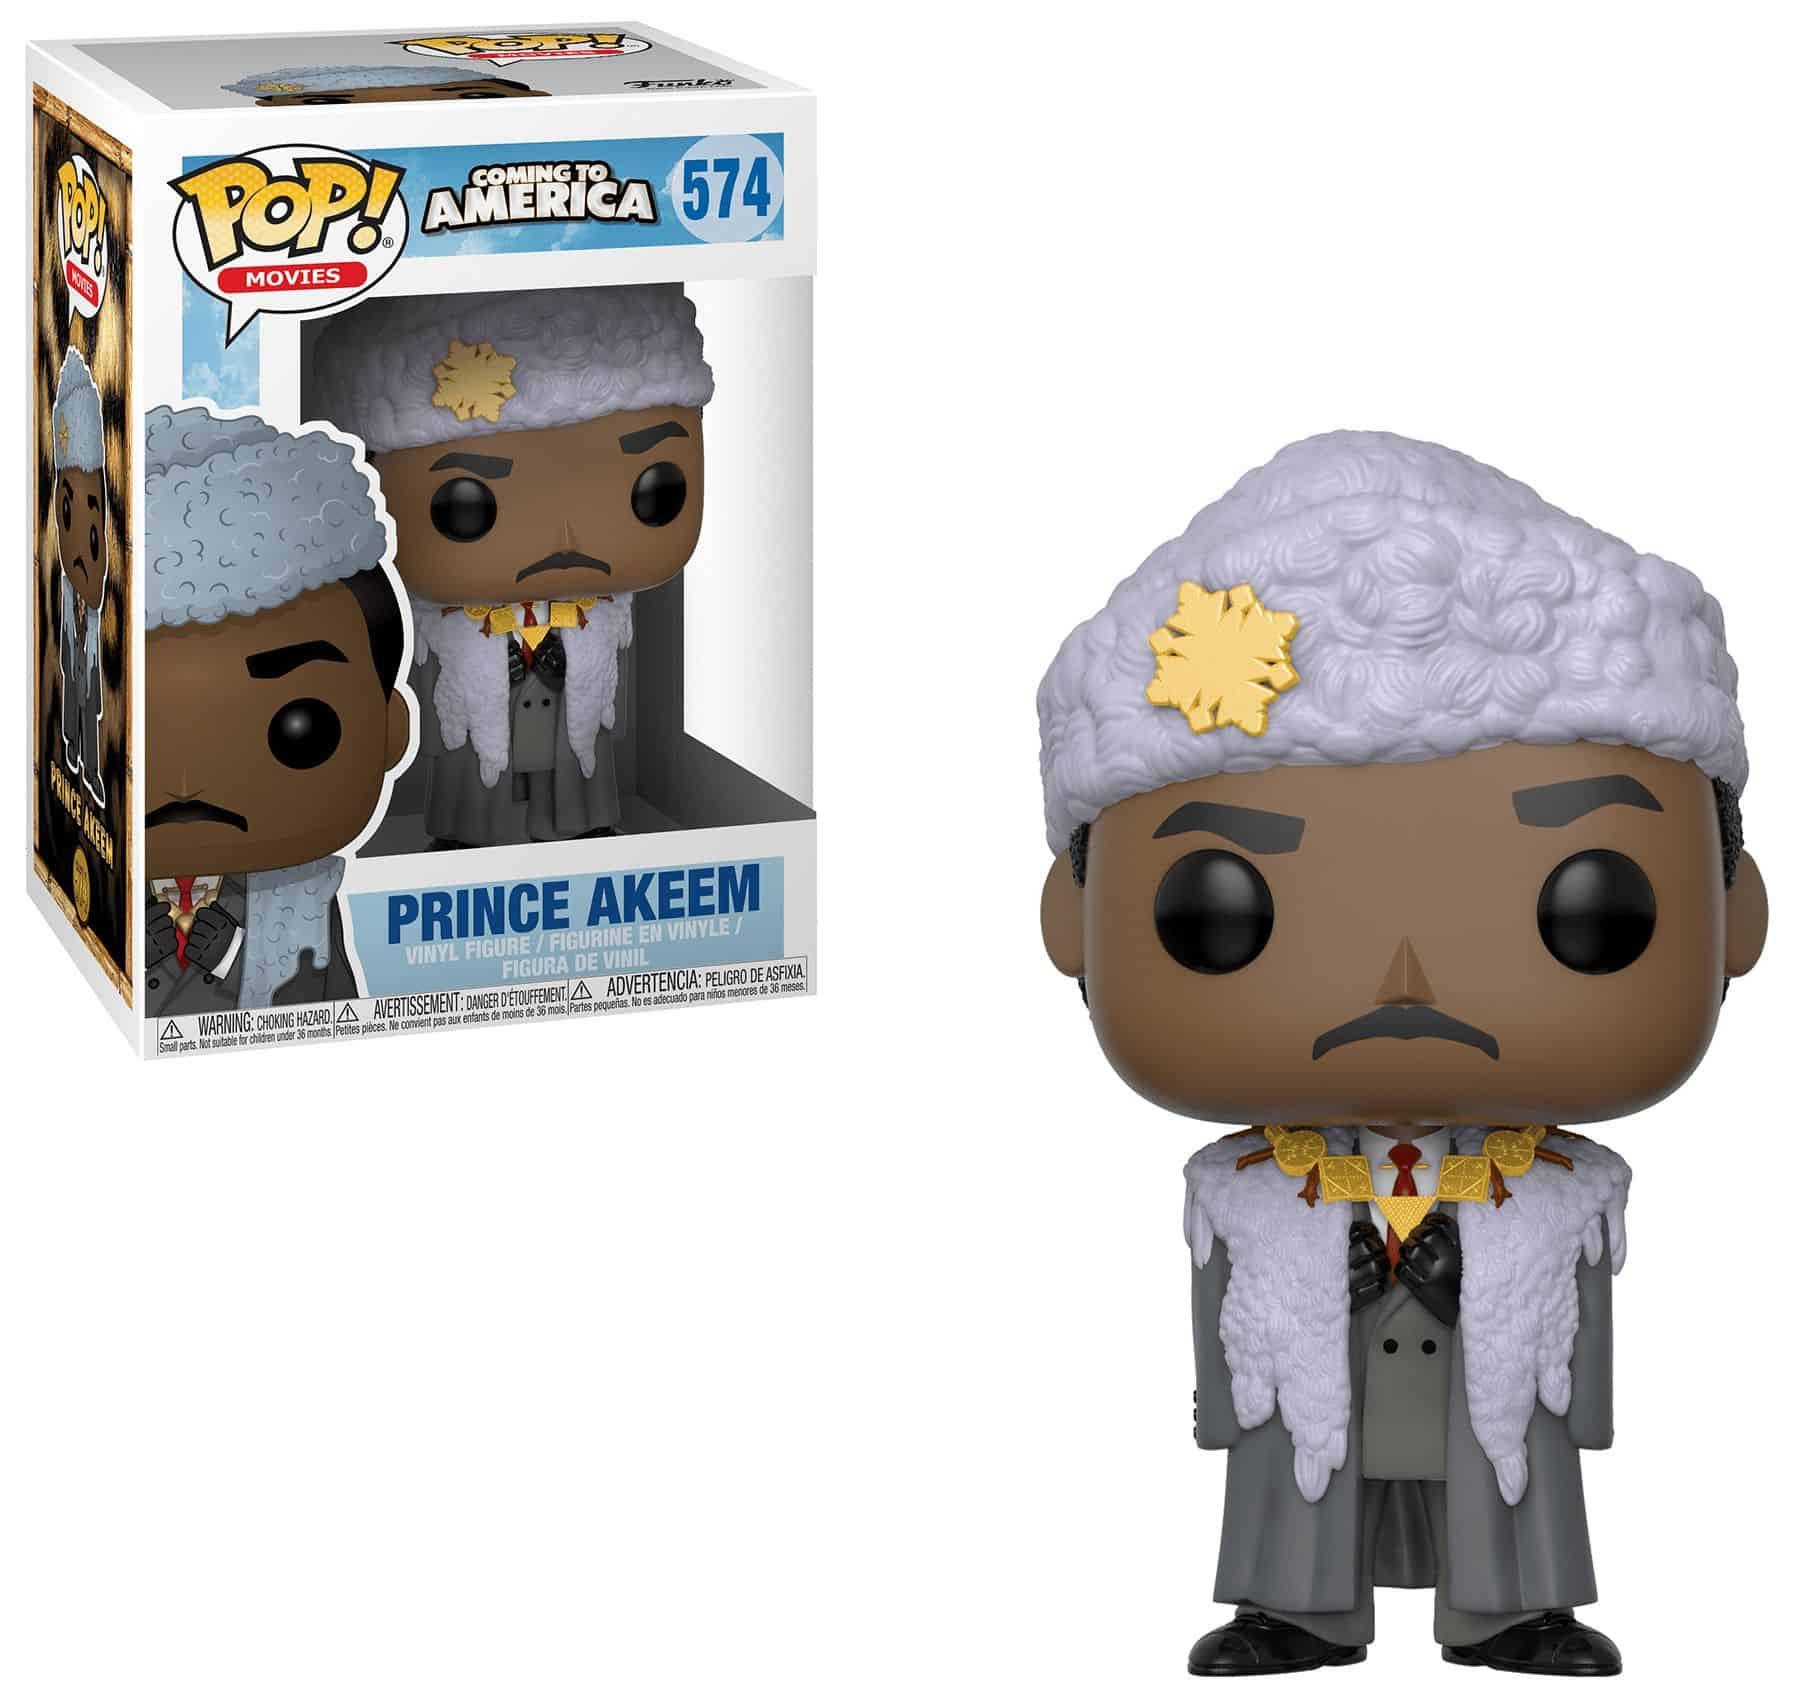 Funko POP! Movies: Coming to America - Prince Akeem Joffer